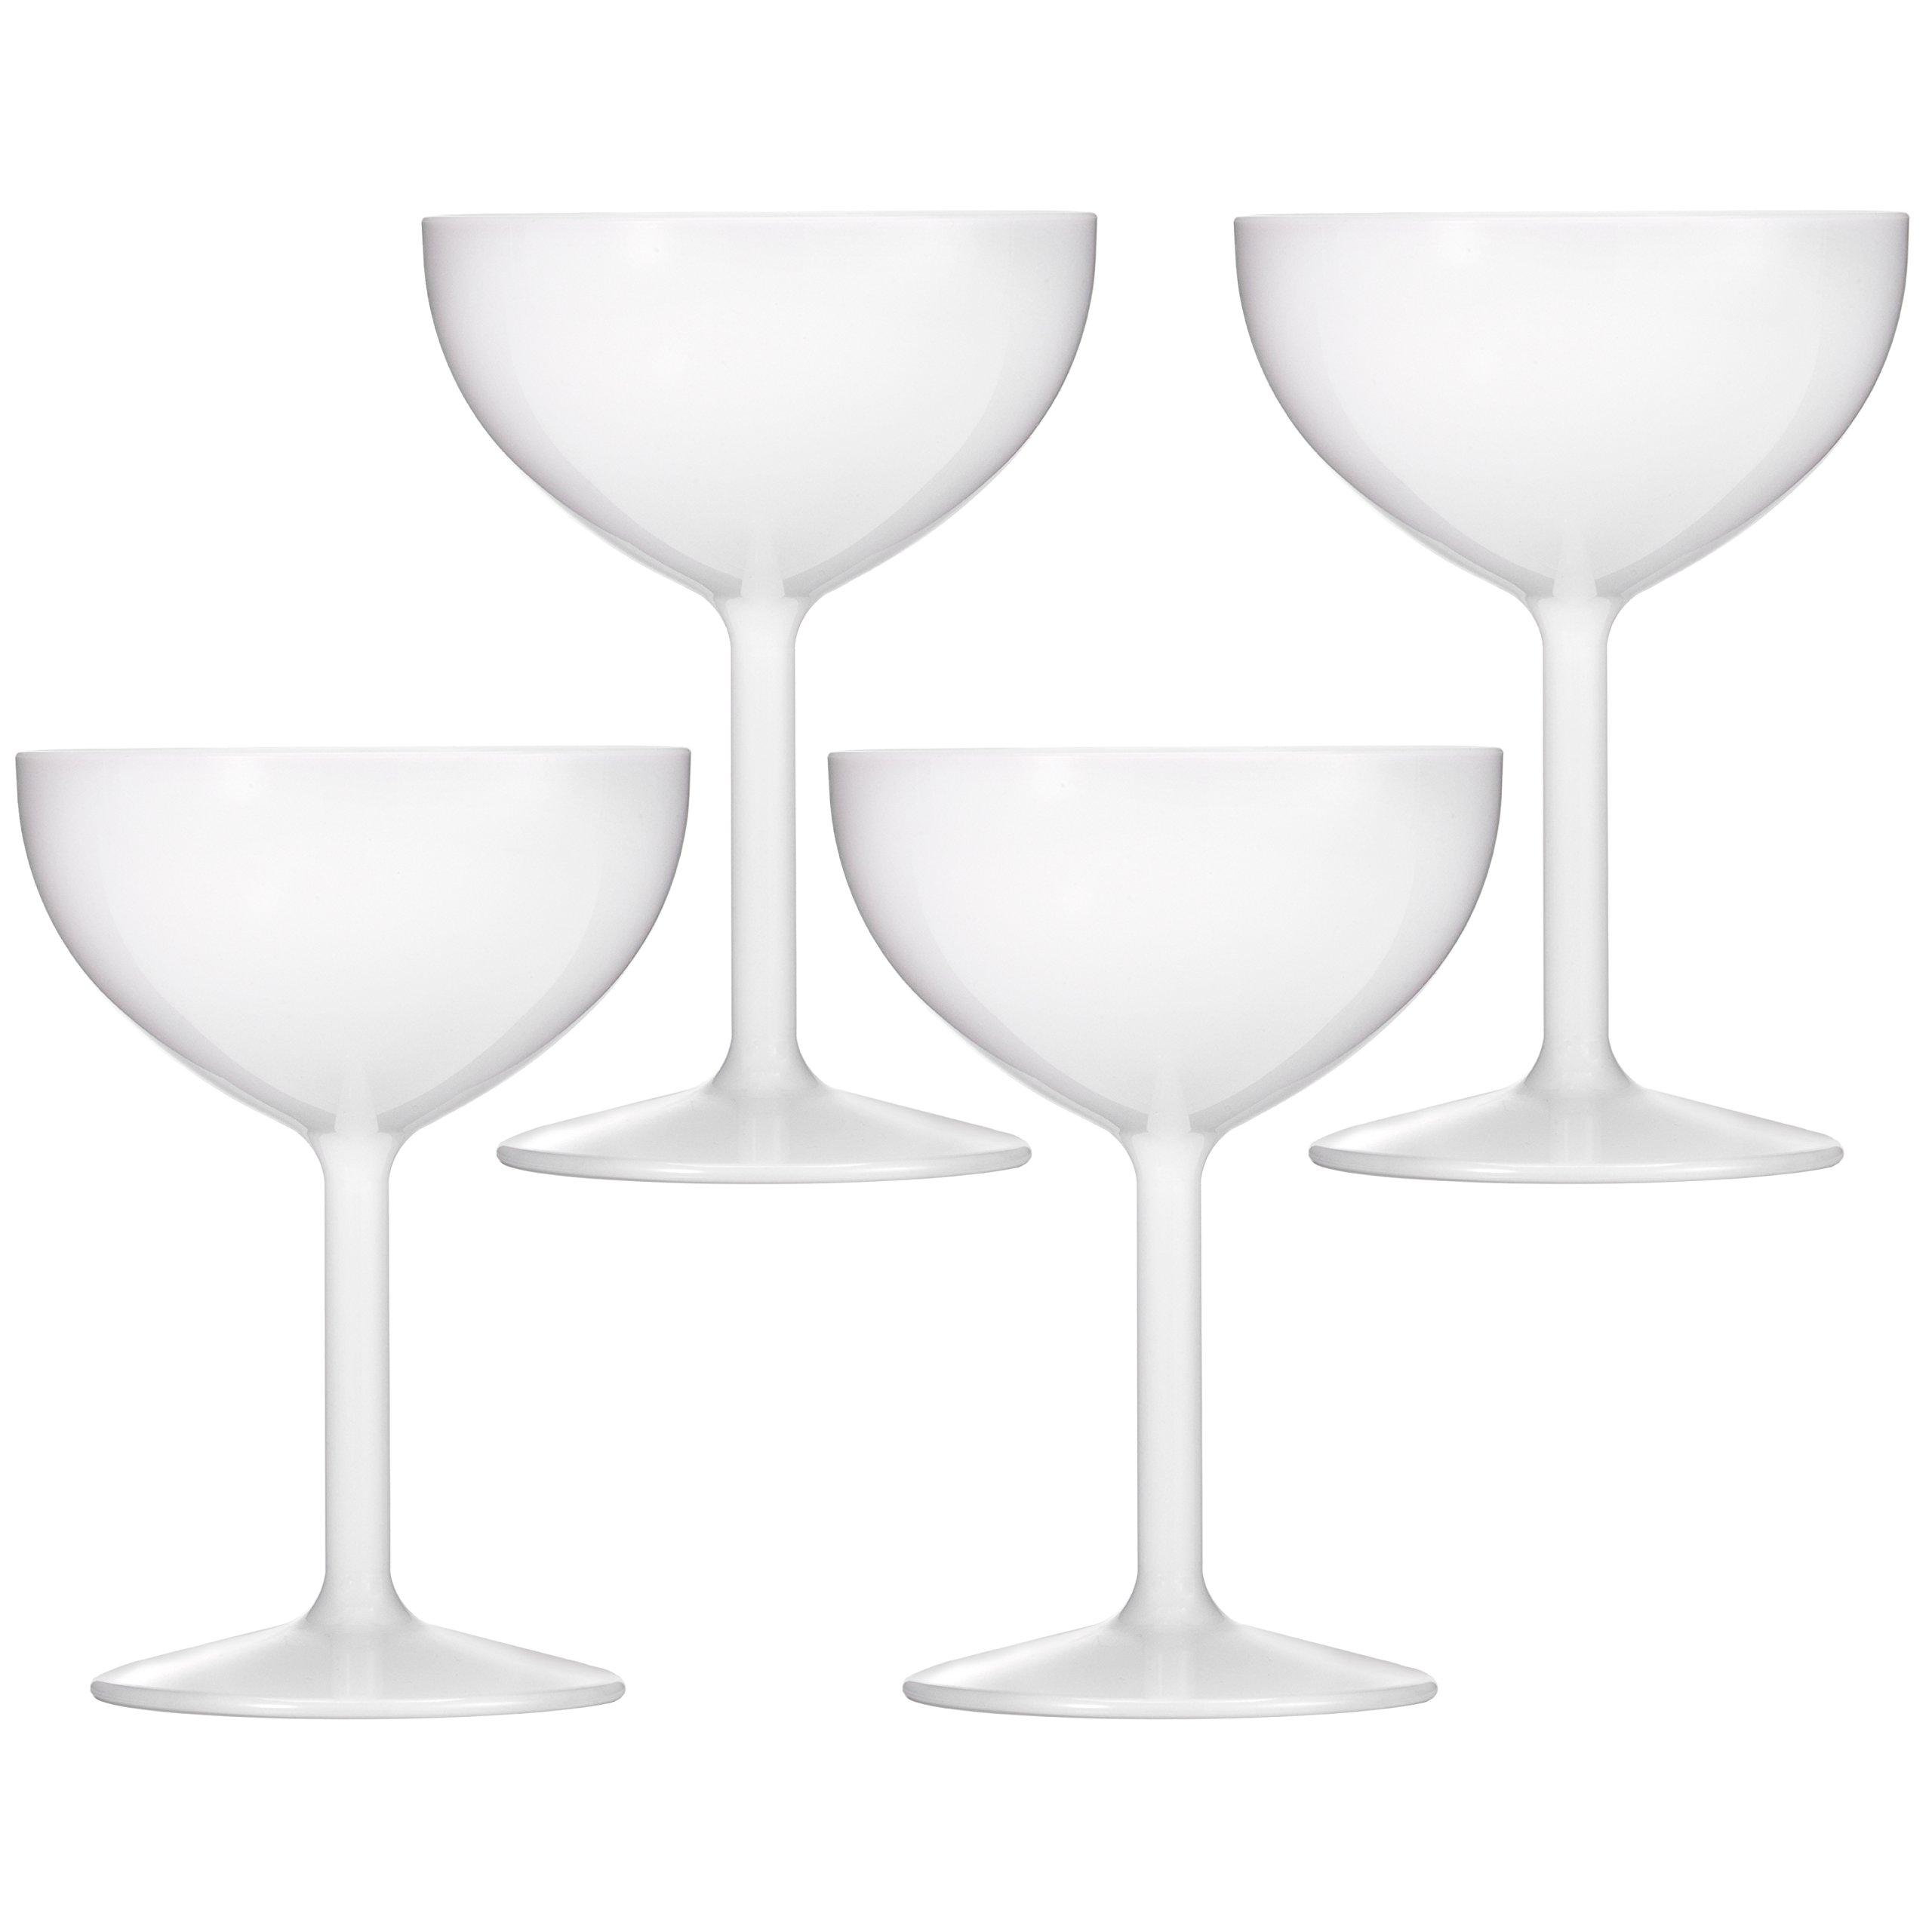 Drinique VIN-CU-WHT-4 Champagne Coupe Unbreakable Tritan Stemware, 8 oz (Set of 4), White